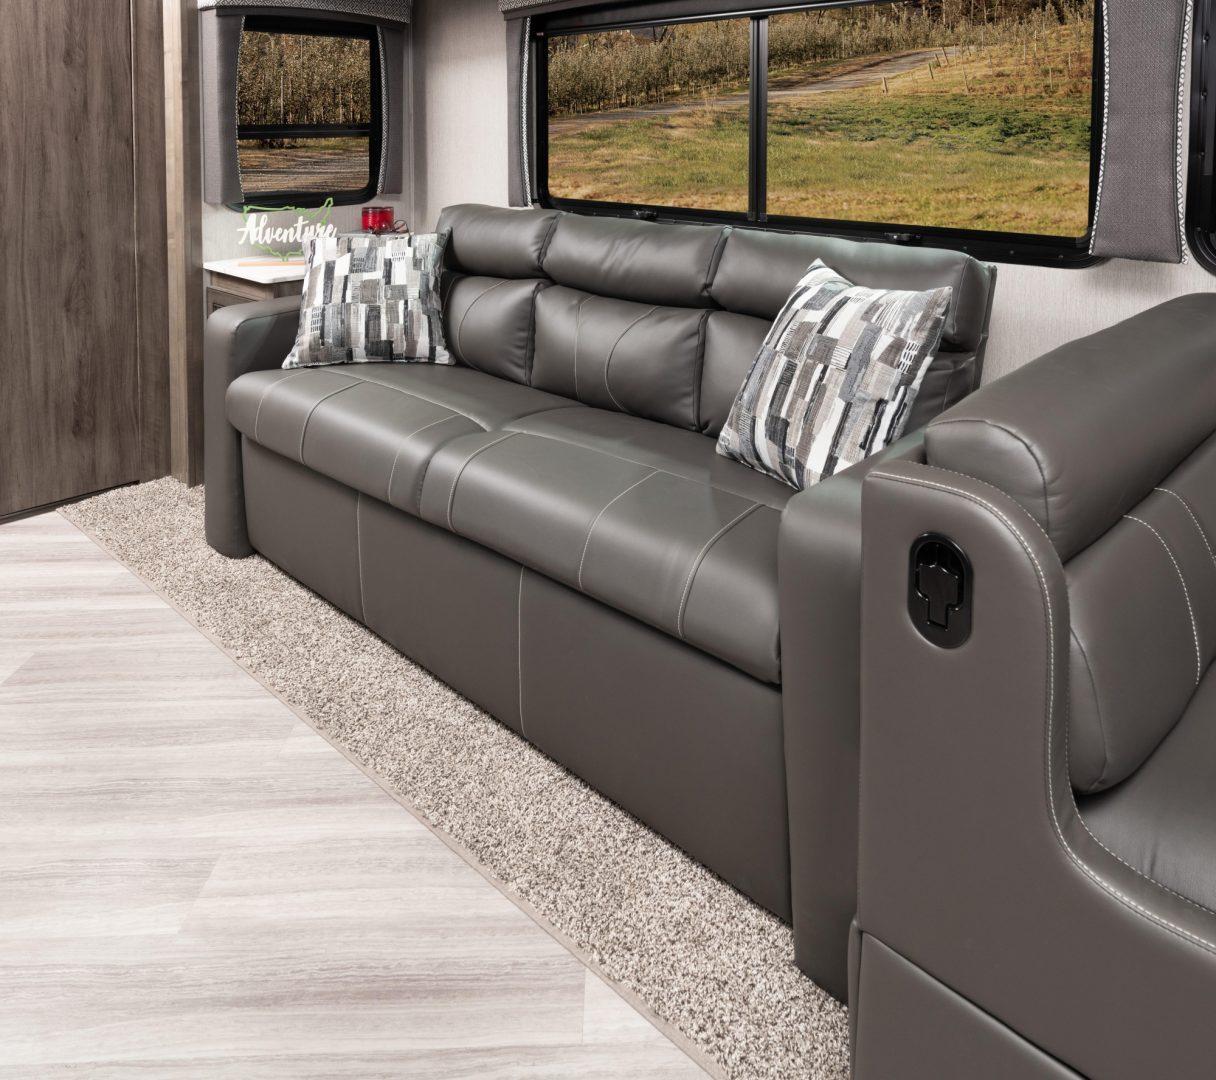 9 sofa VAC33 C moonscape WW MY22 5335